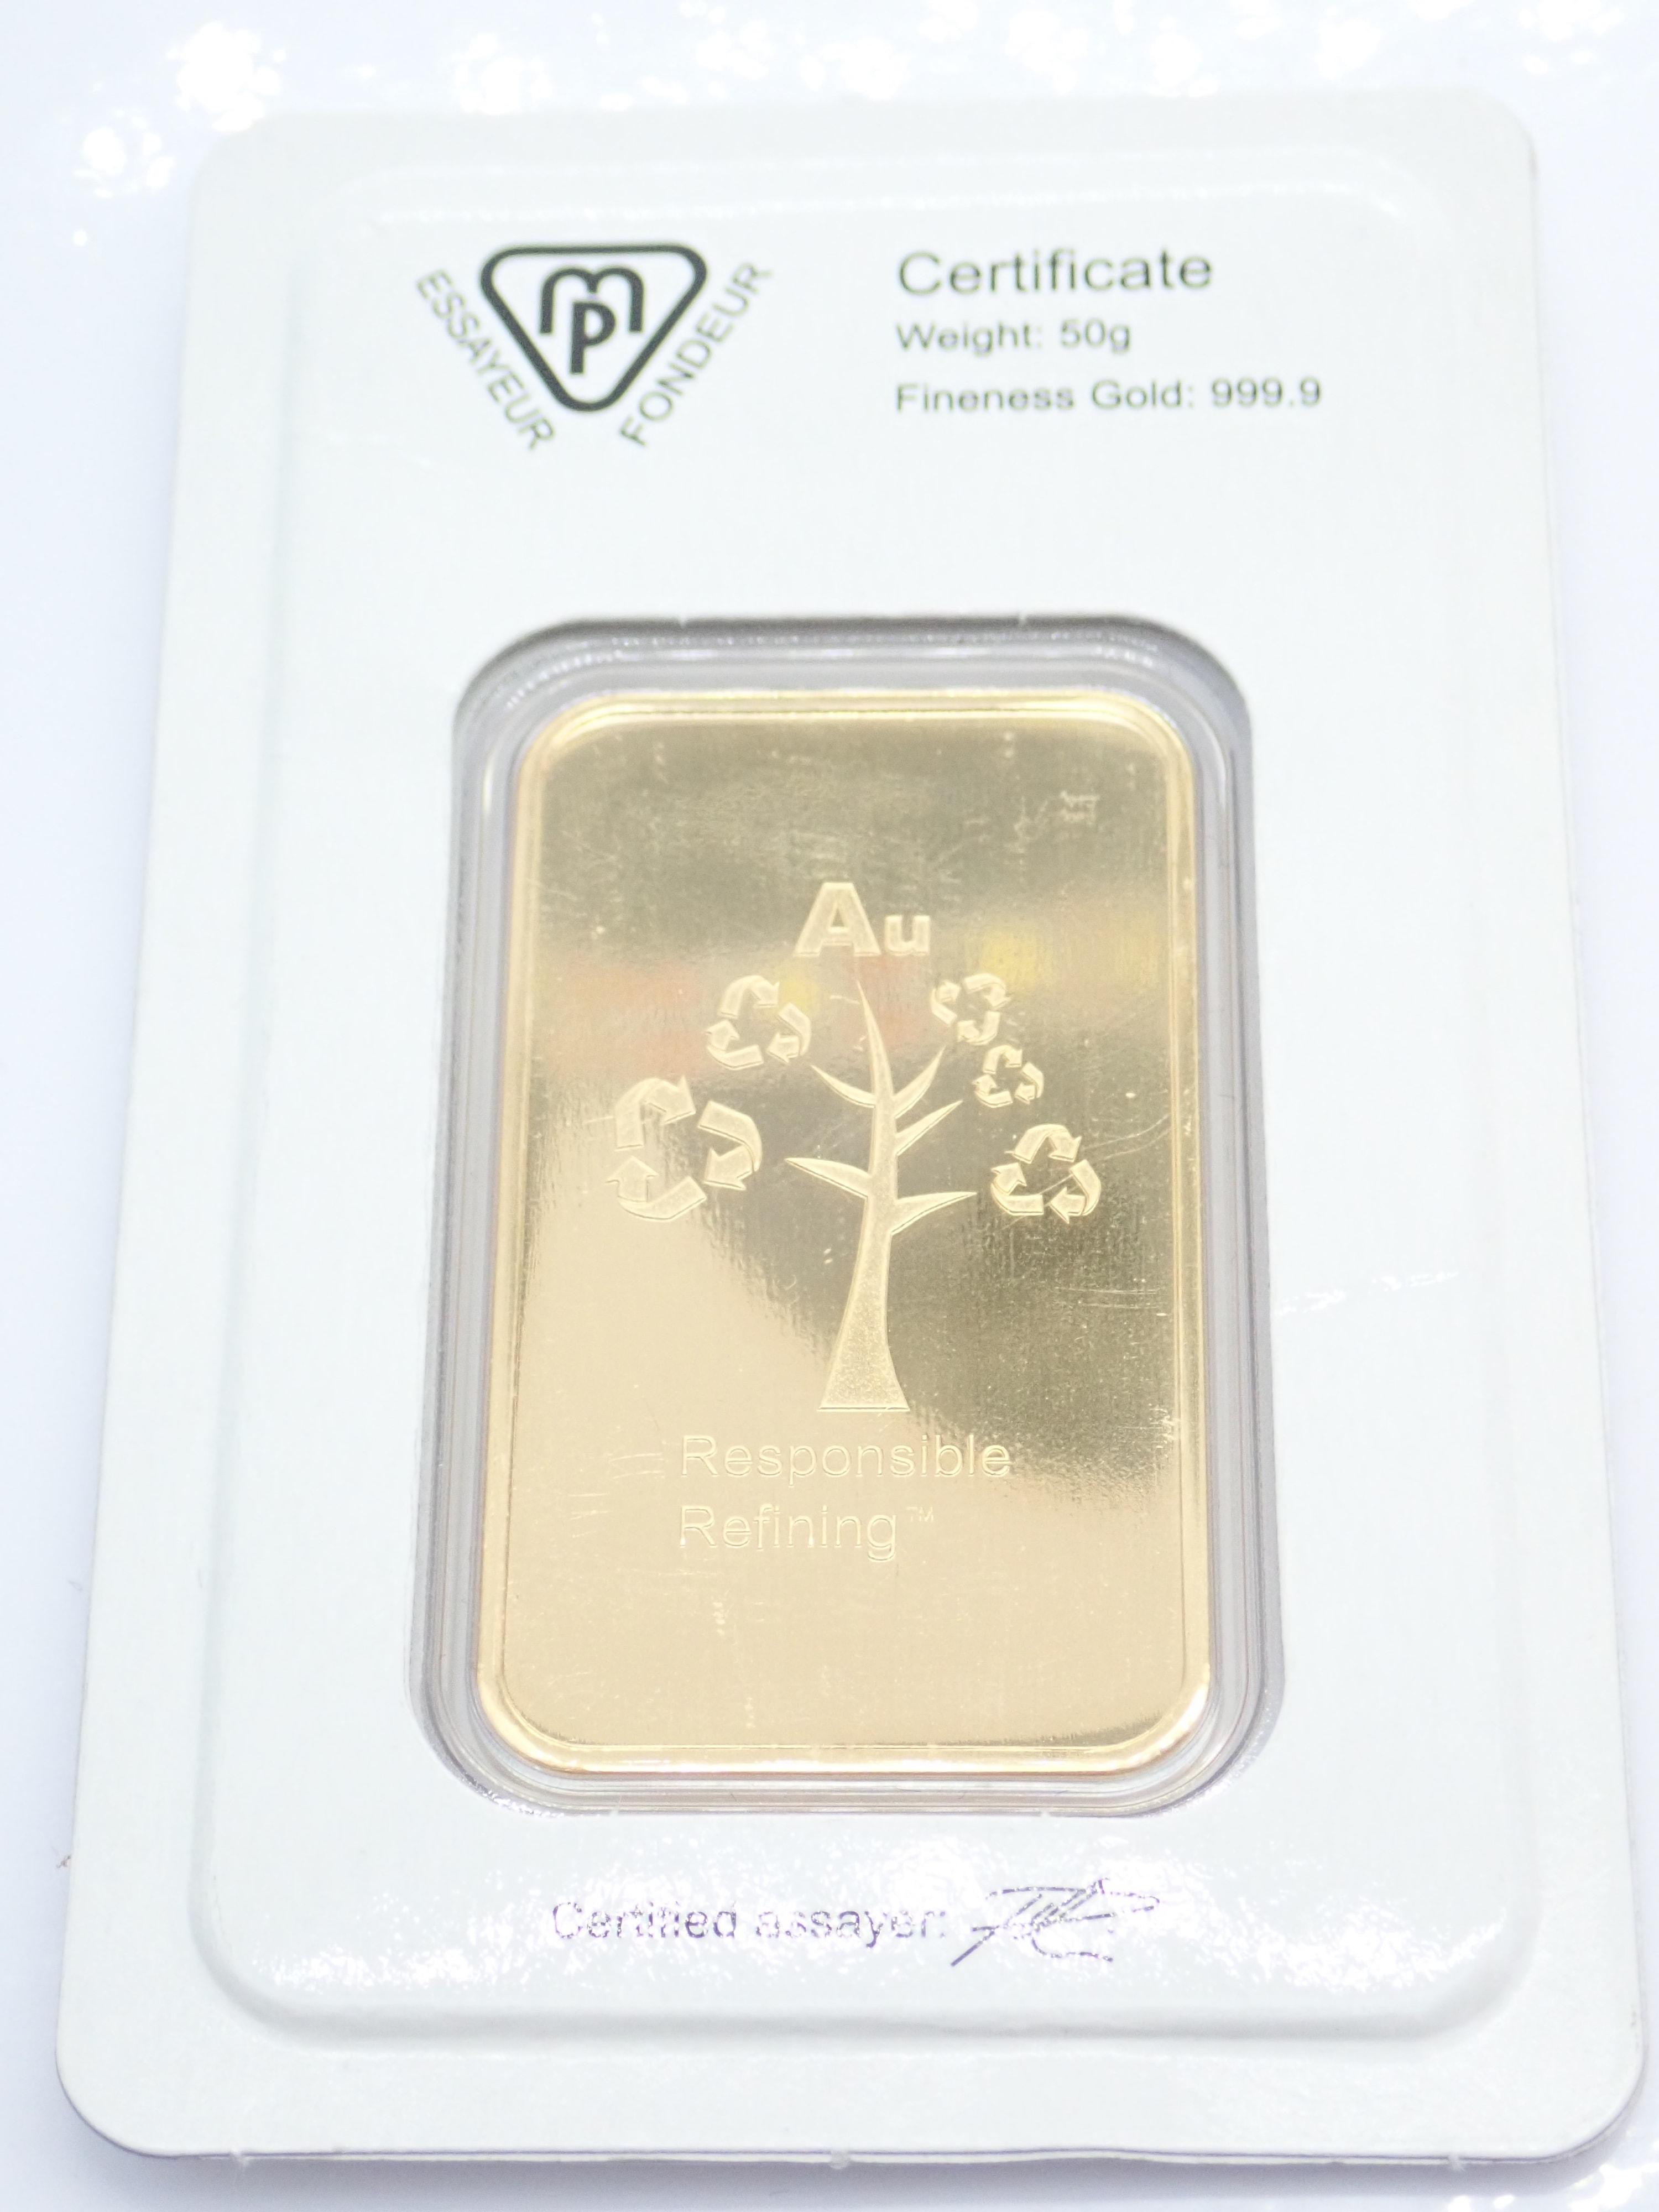 AA000816 1 - 50 gram Swiss Metalor 24 Carat Fine Gold 999.9  #